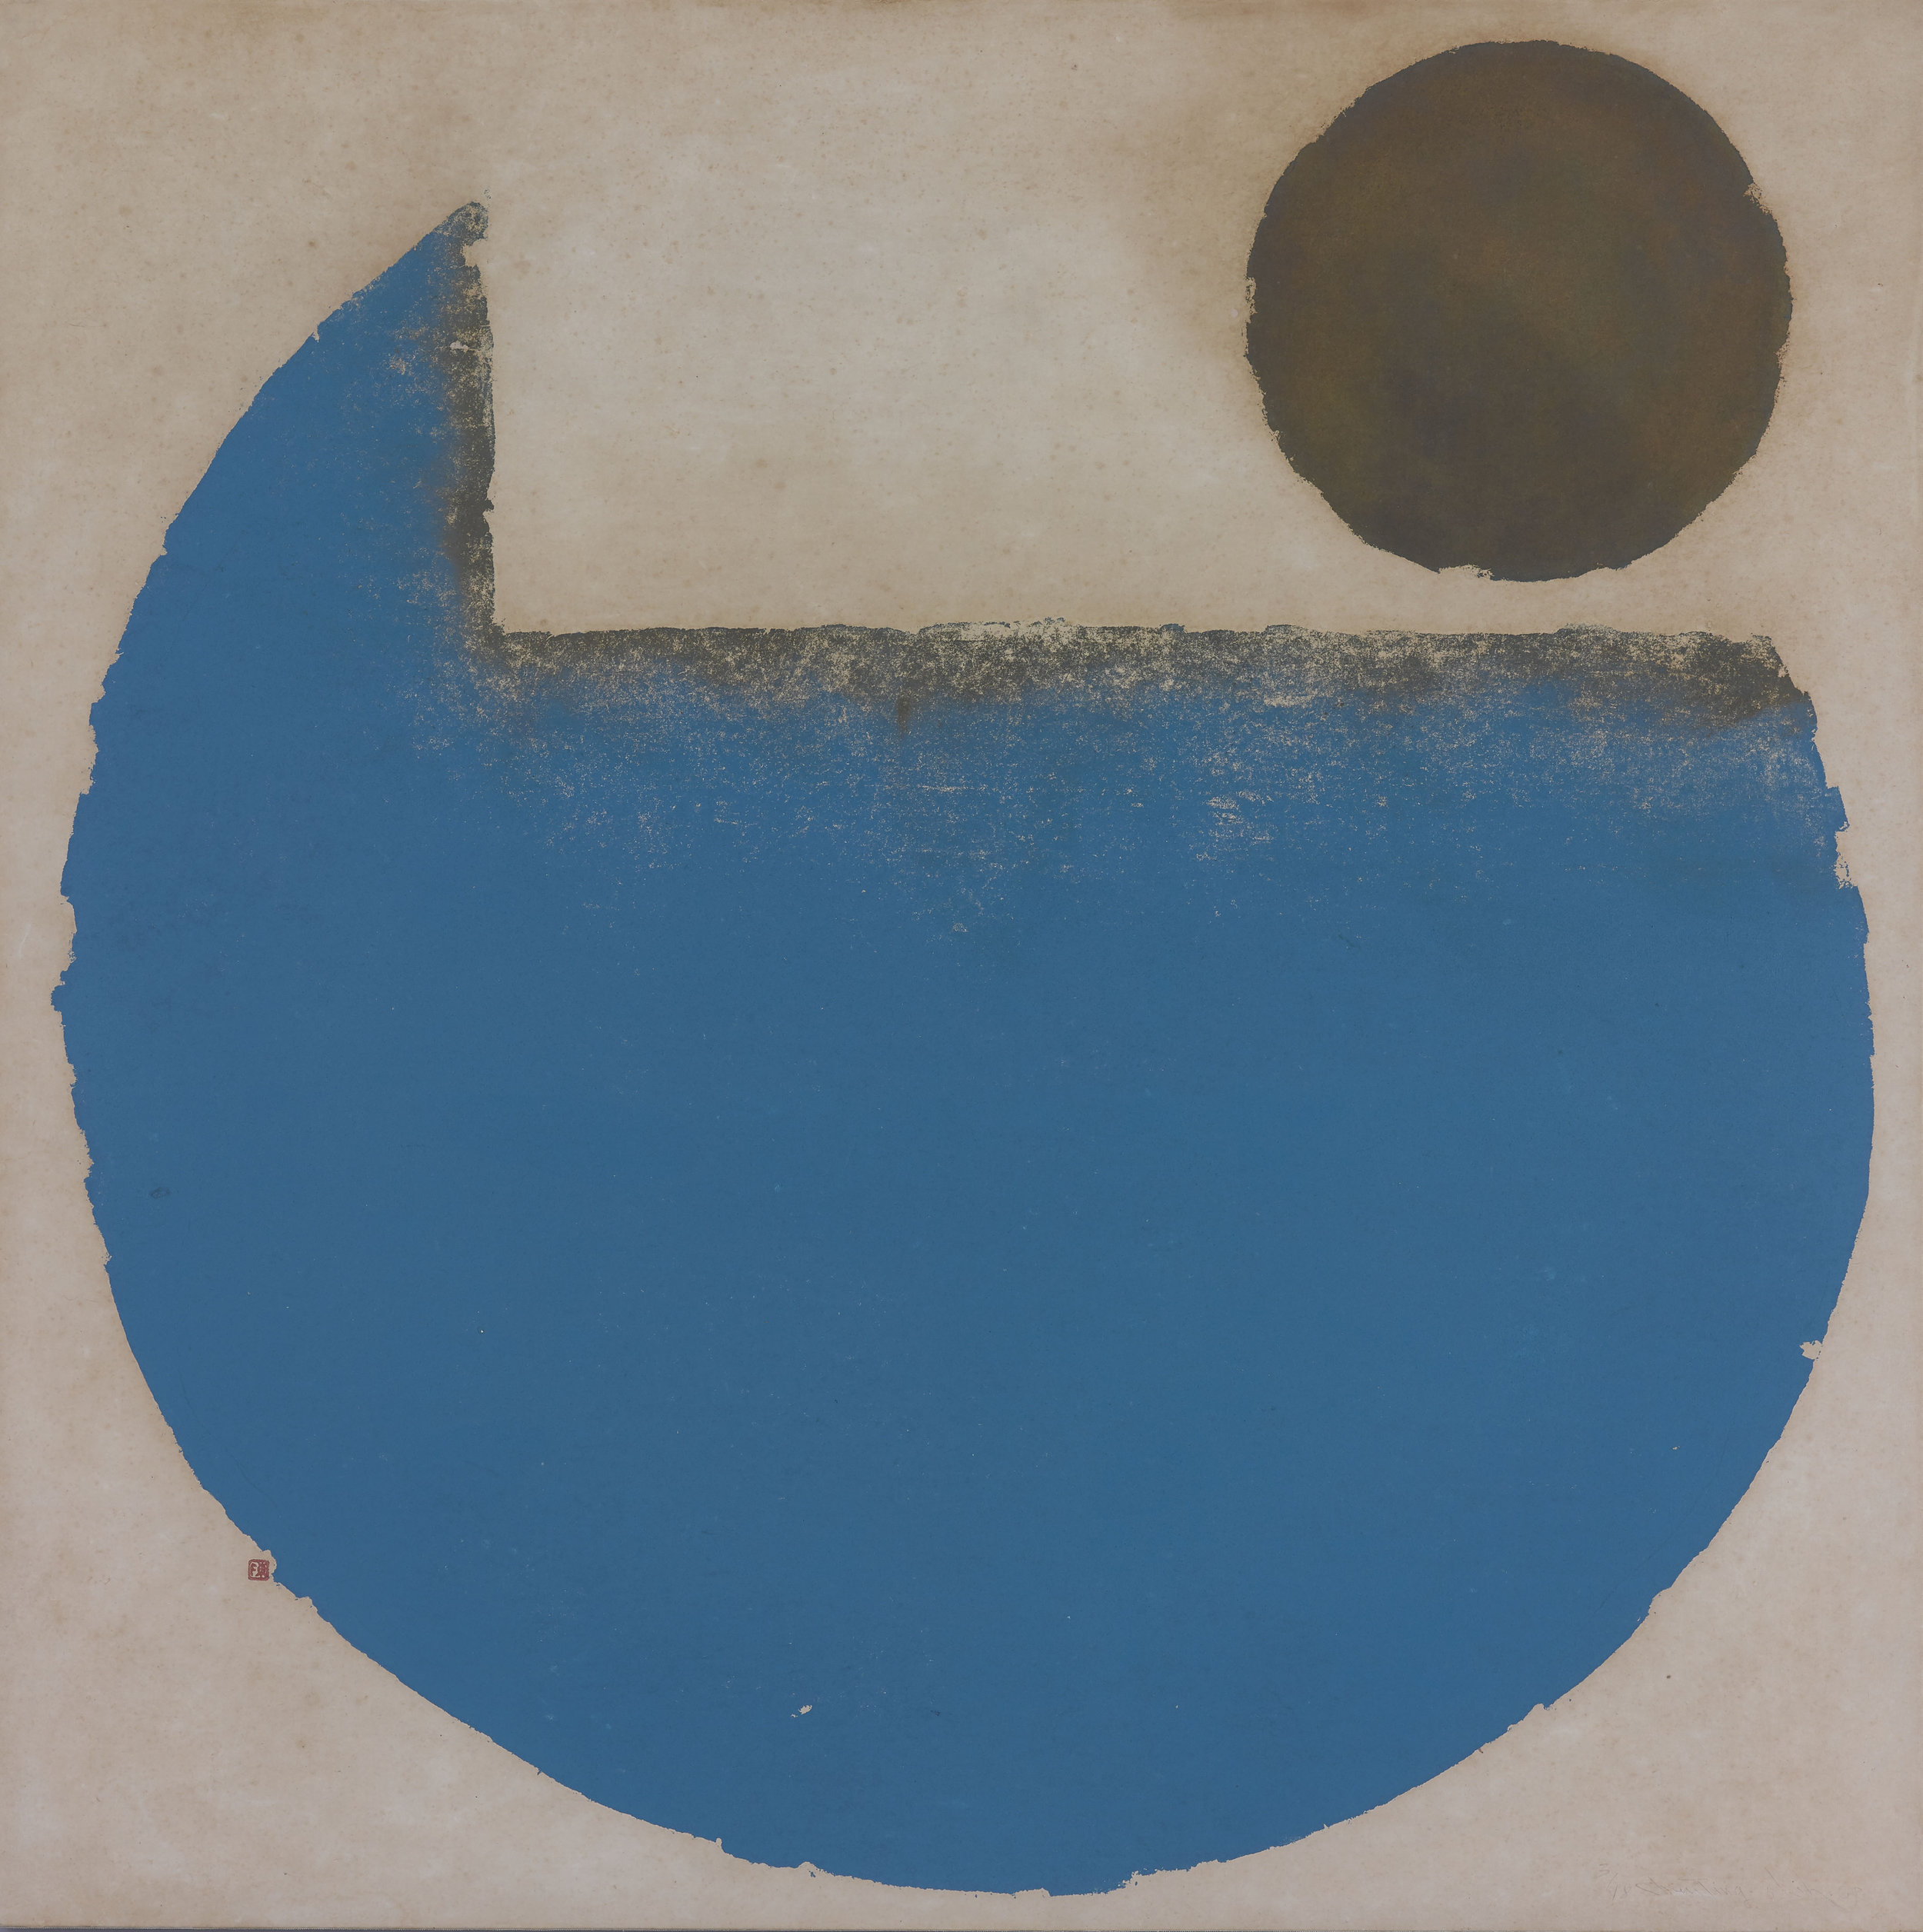 Chen Ting-Shih, Rhythm of the Sea, 91.5x91.5cm, ed 3:18, woodcut print, 1969.jpg